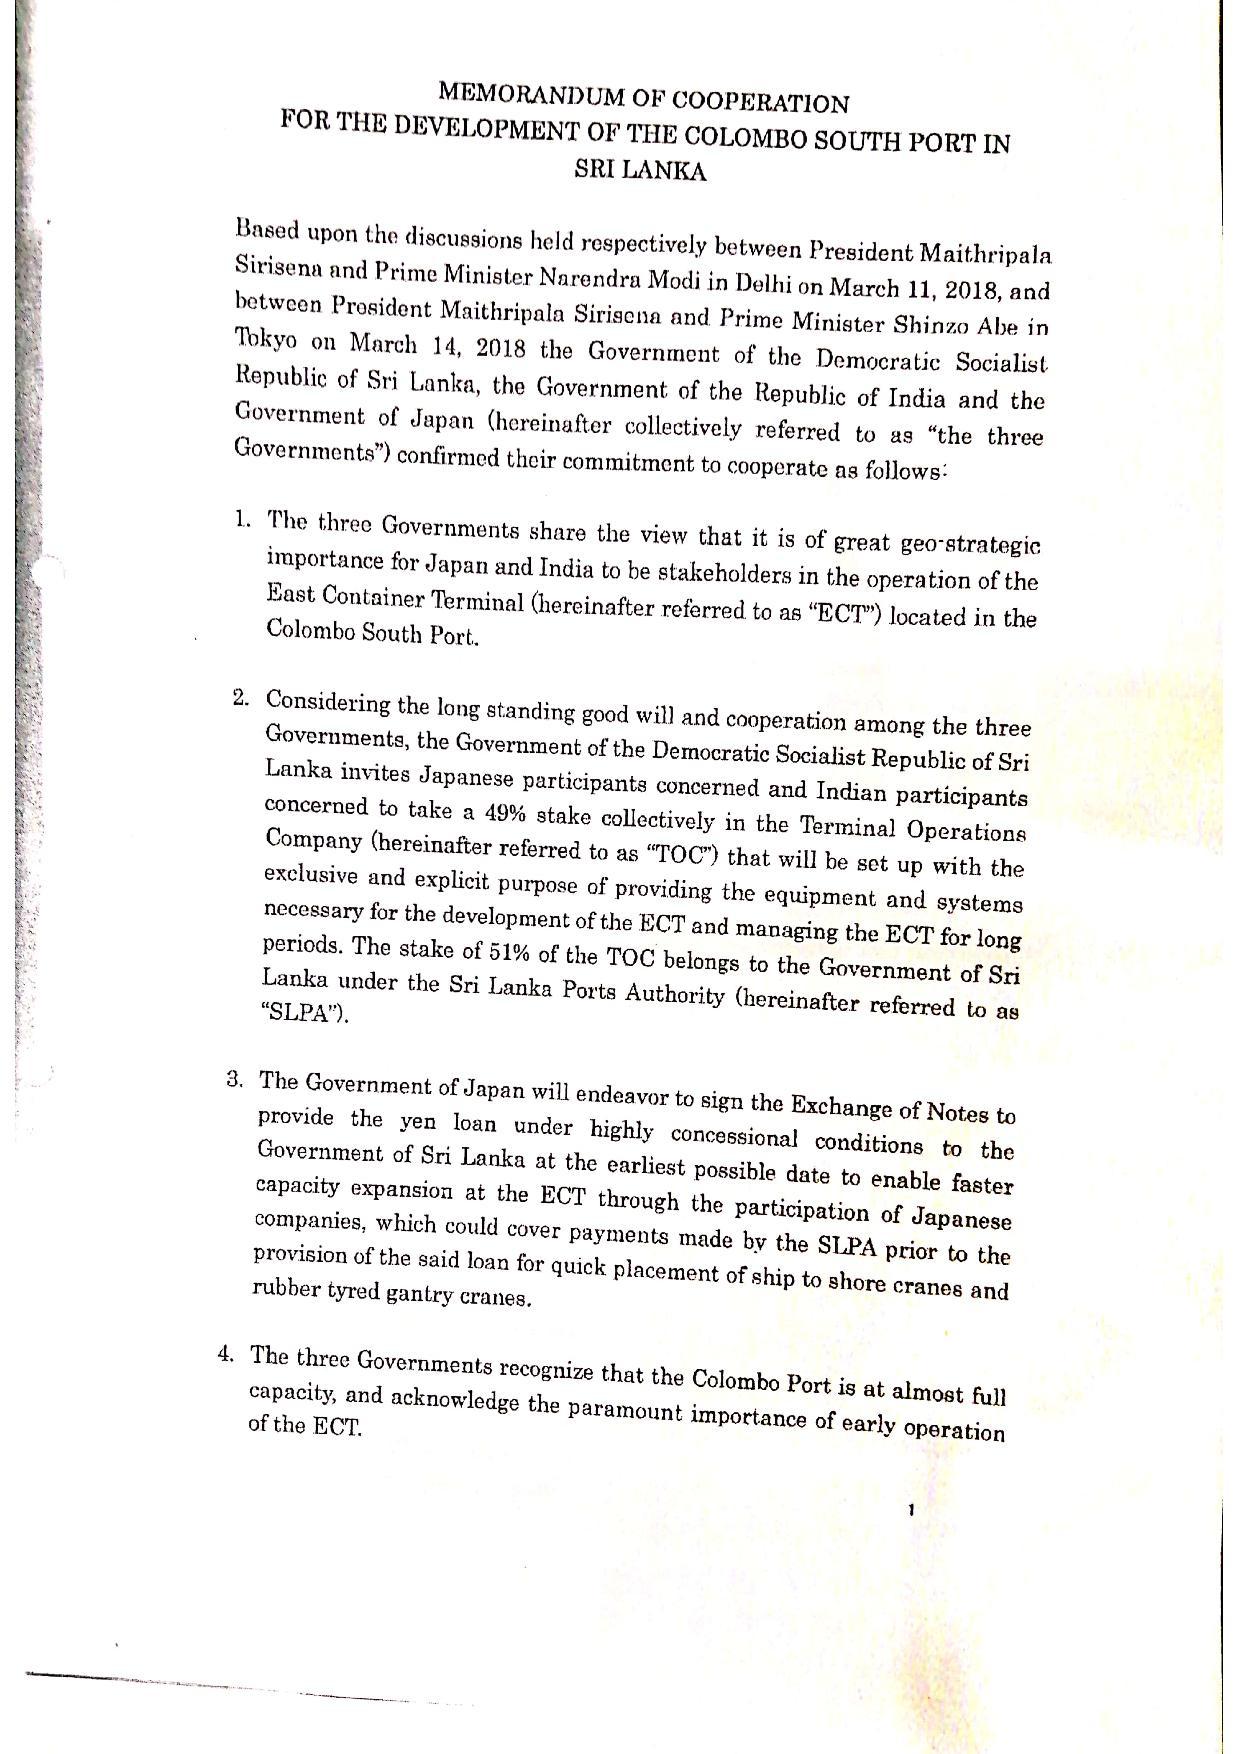 May 2019 Sri Lanka Cabinet Memo p.2